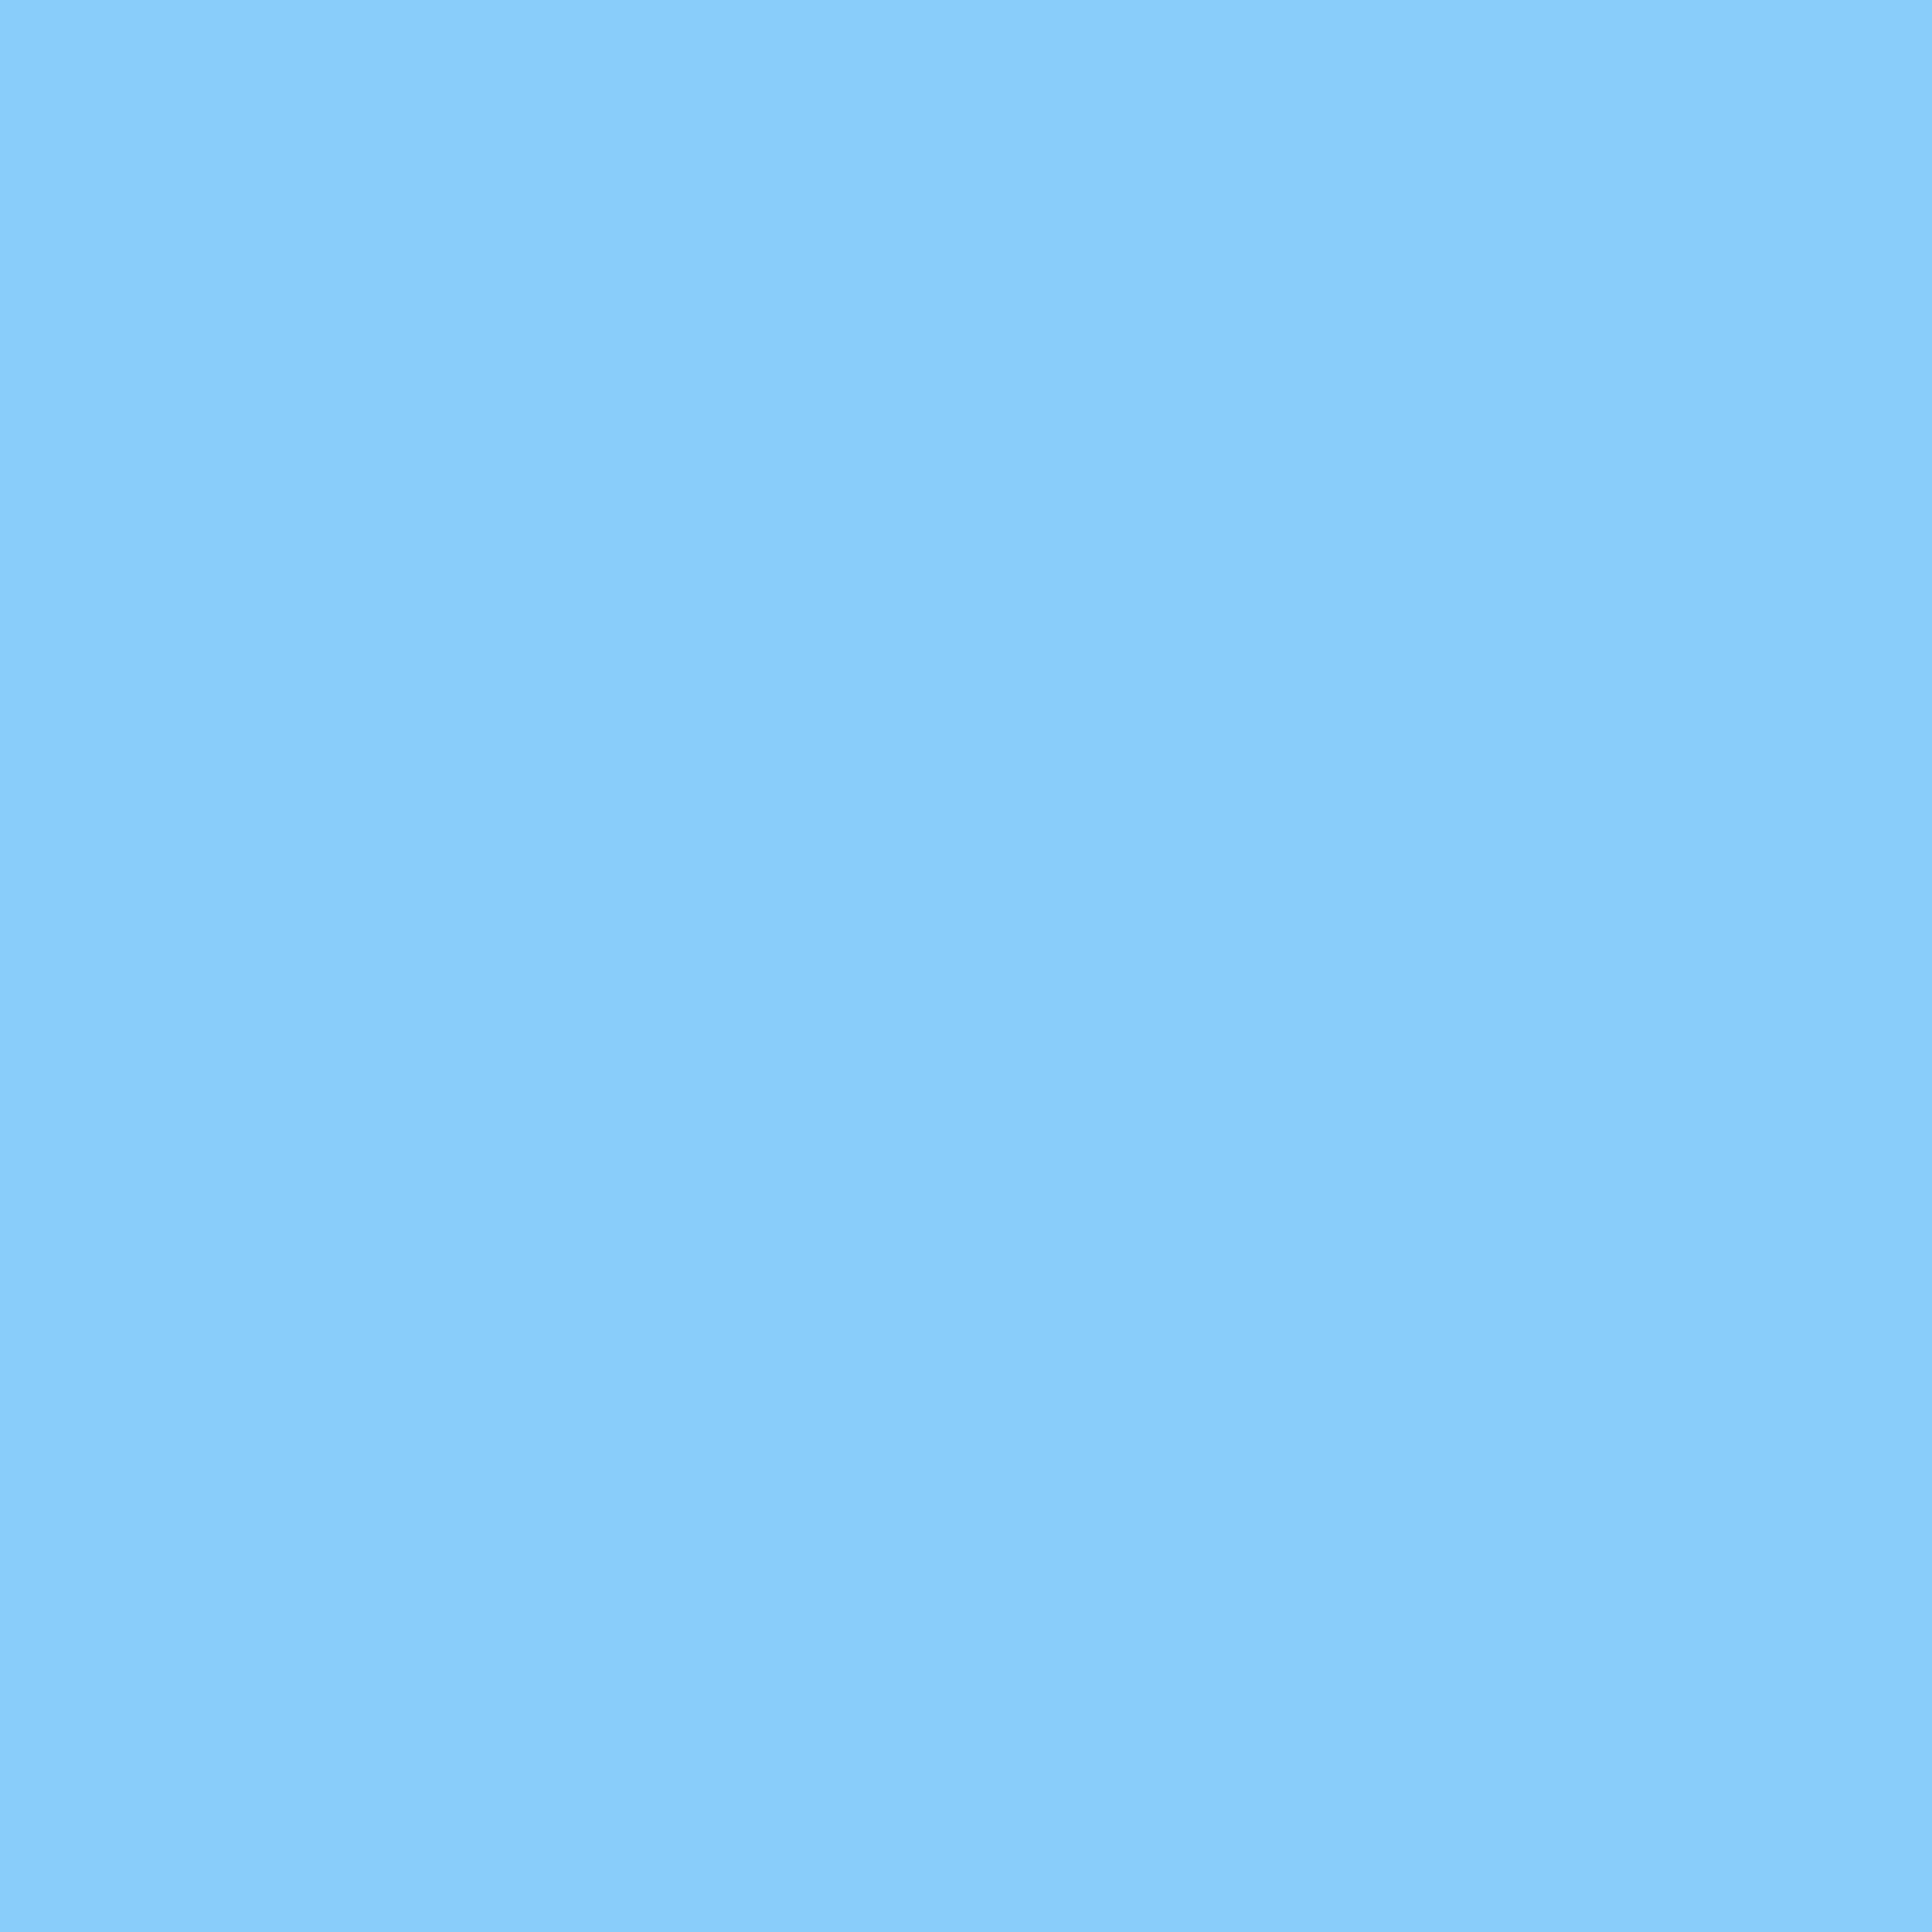 2048x2048 Light Sky Blue Solid Color Background